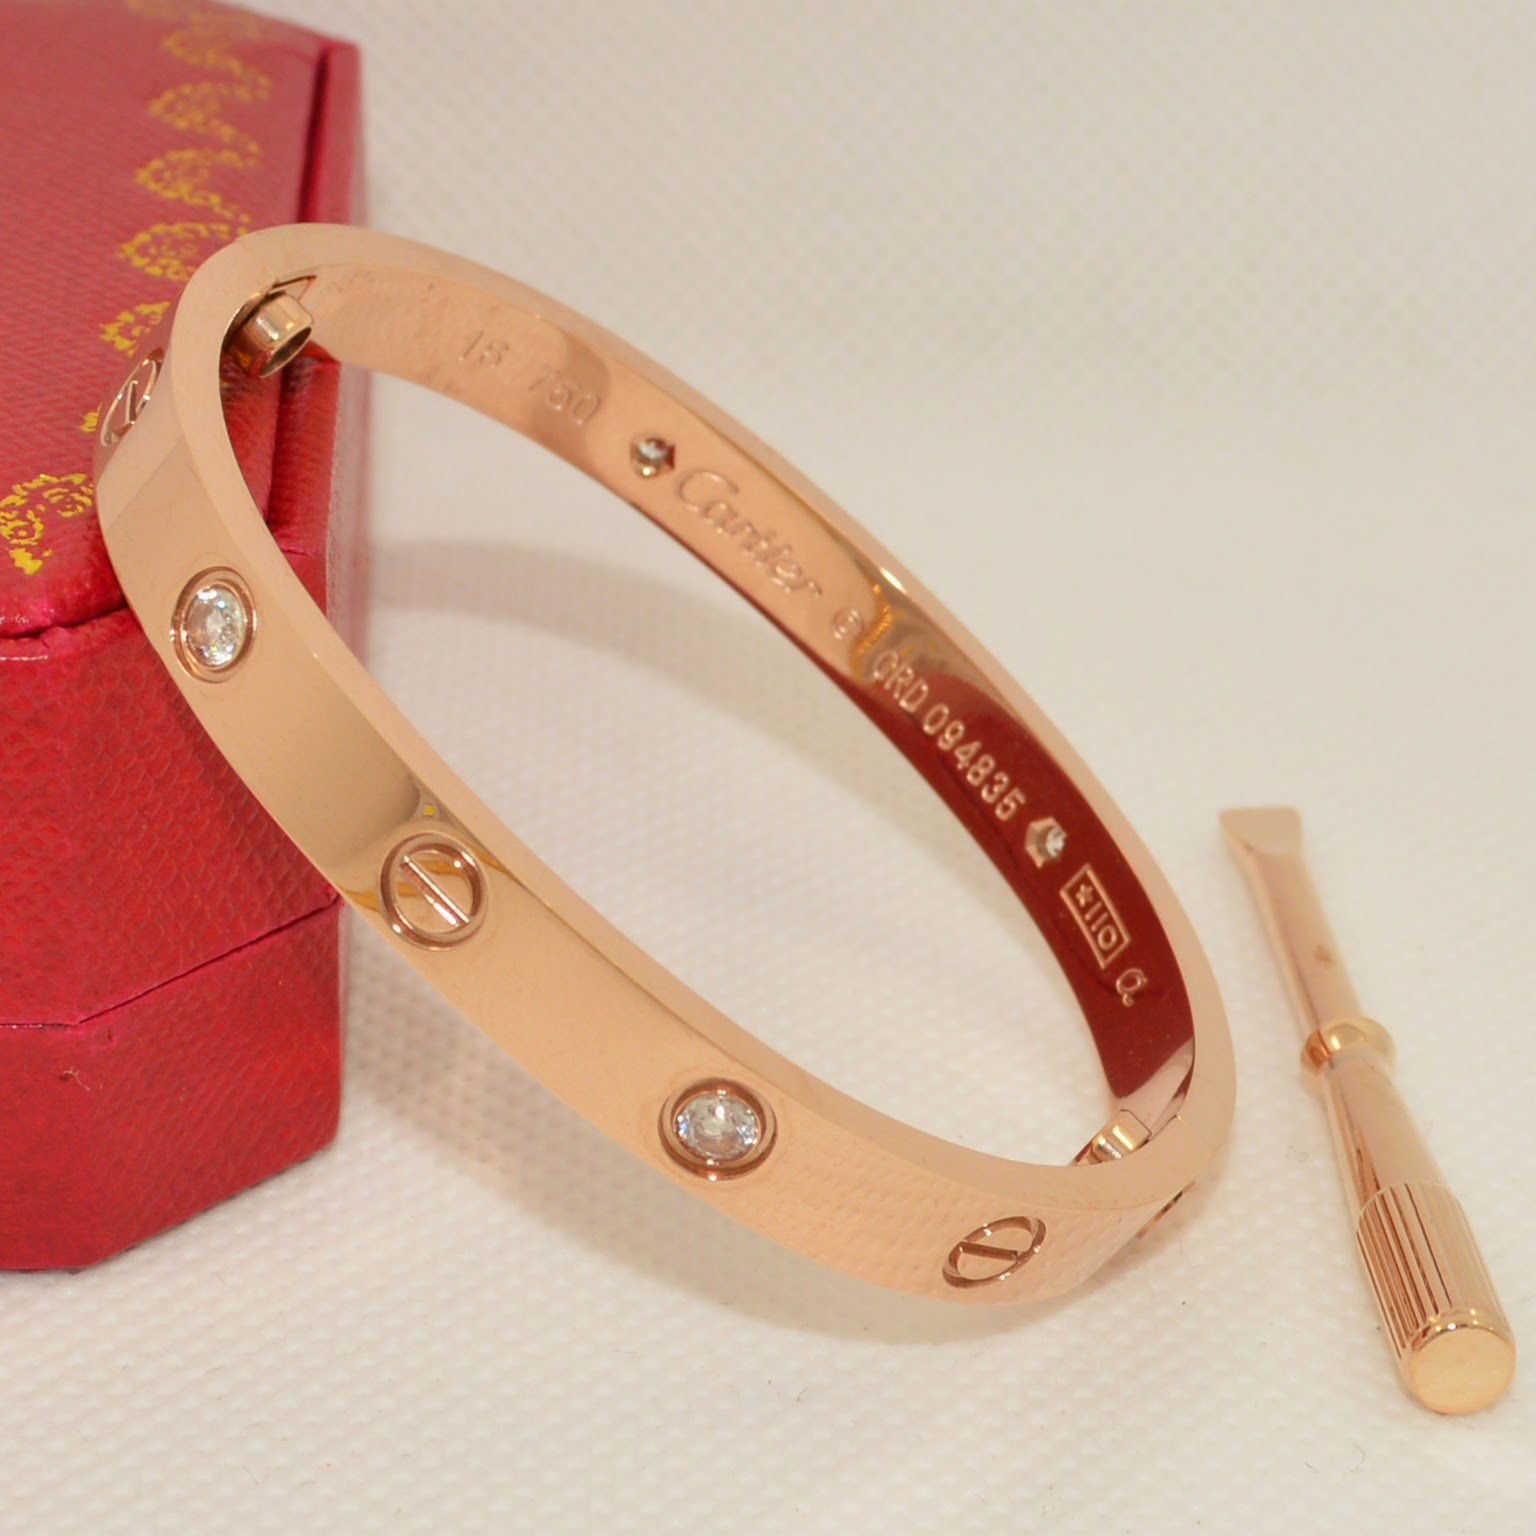 cartier love bracelet replica best for birthday gifts